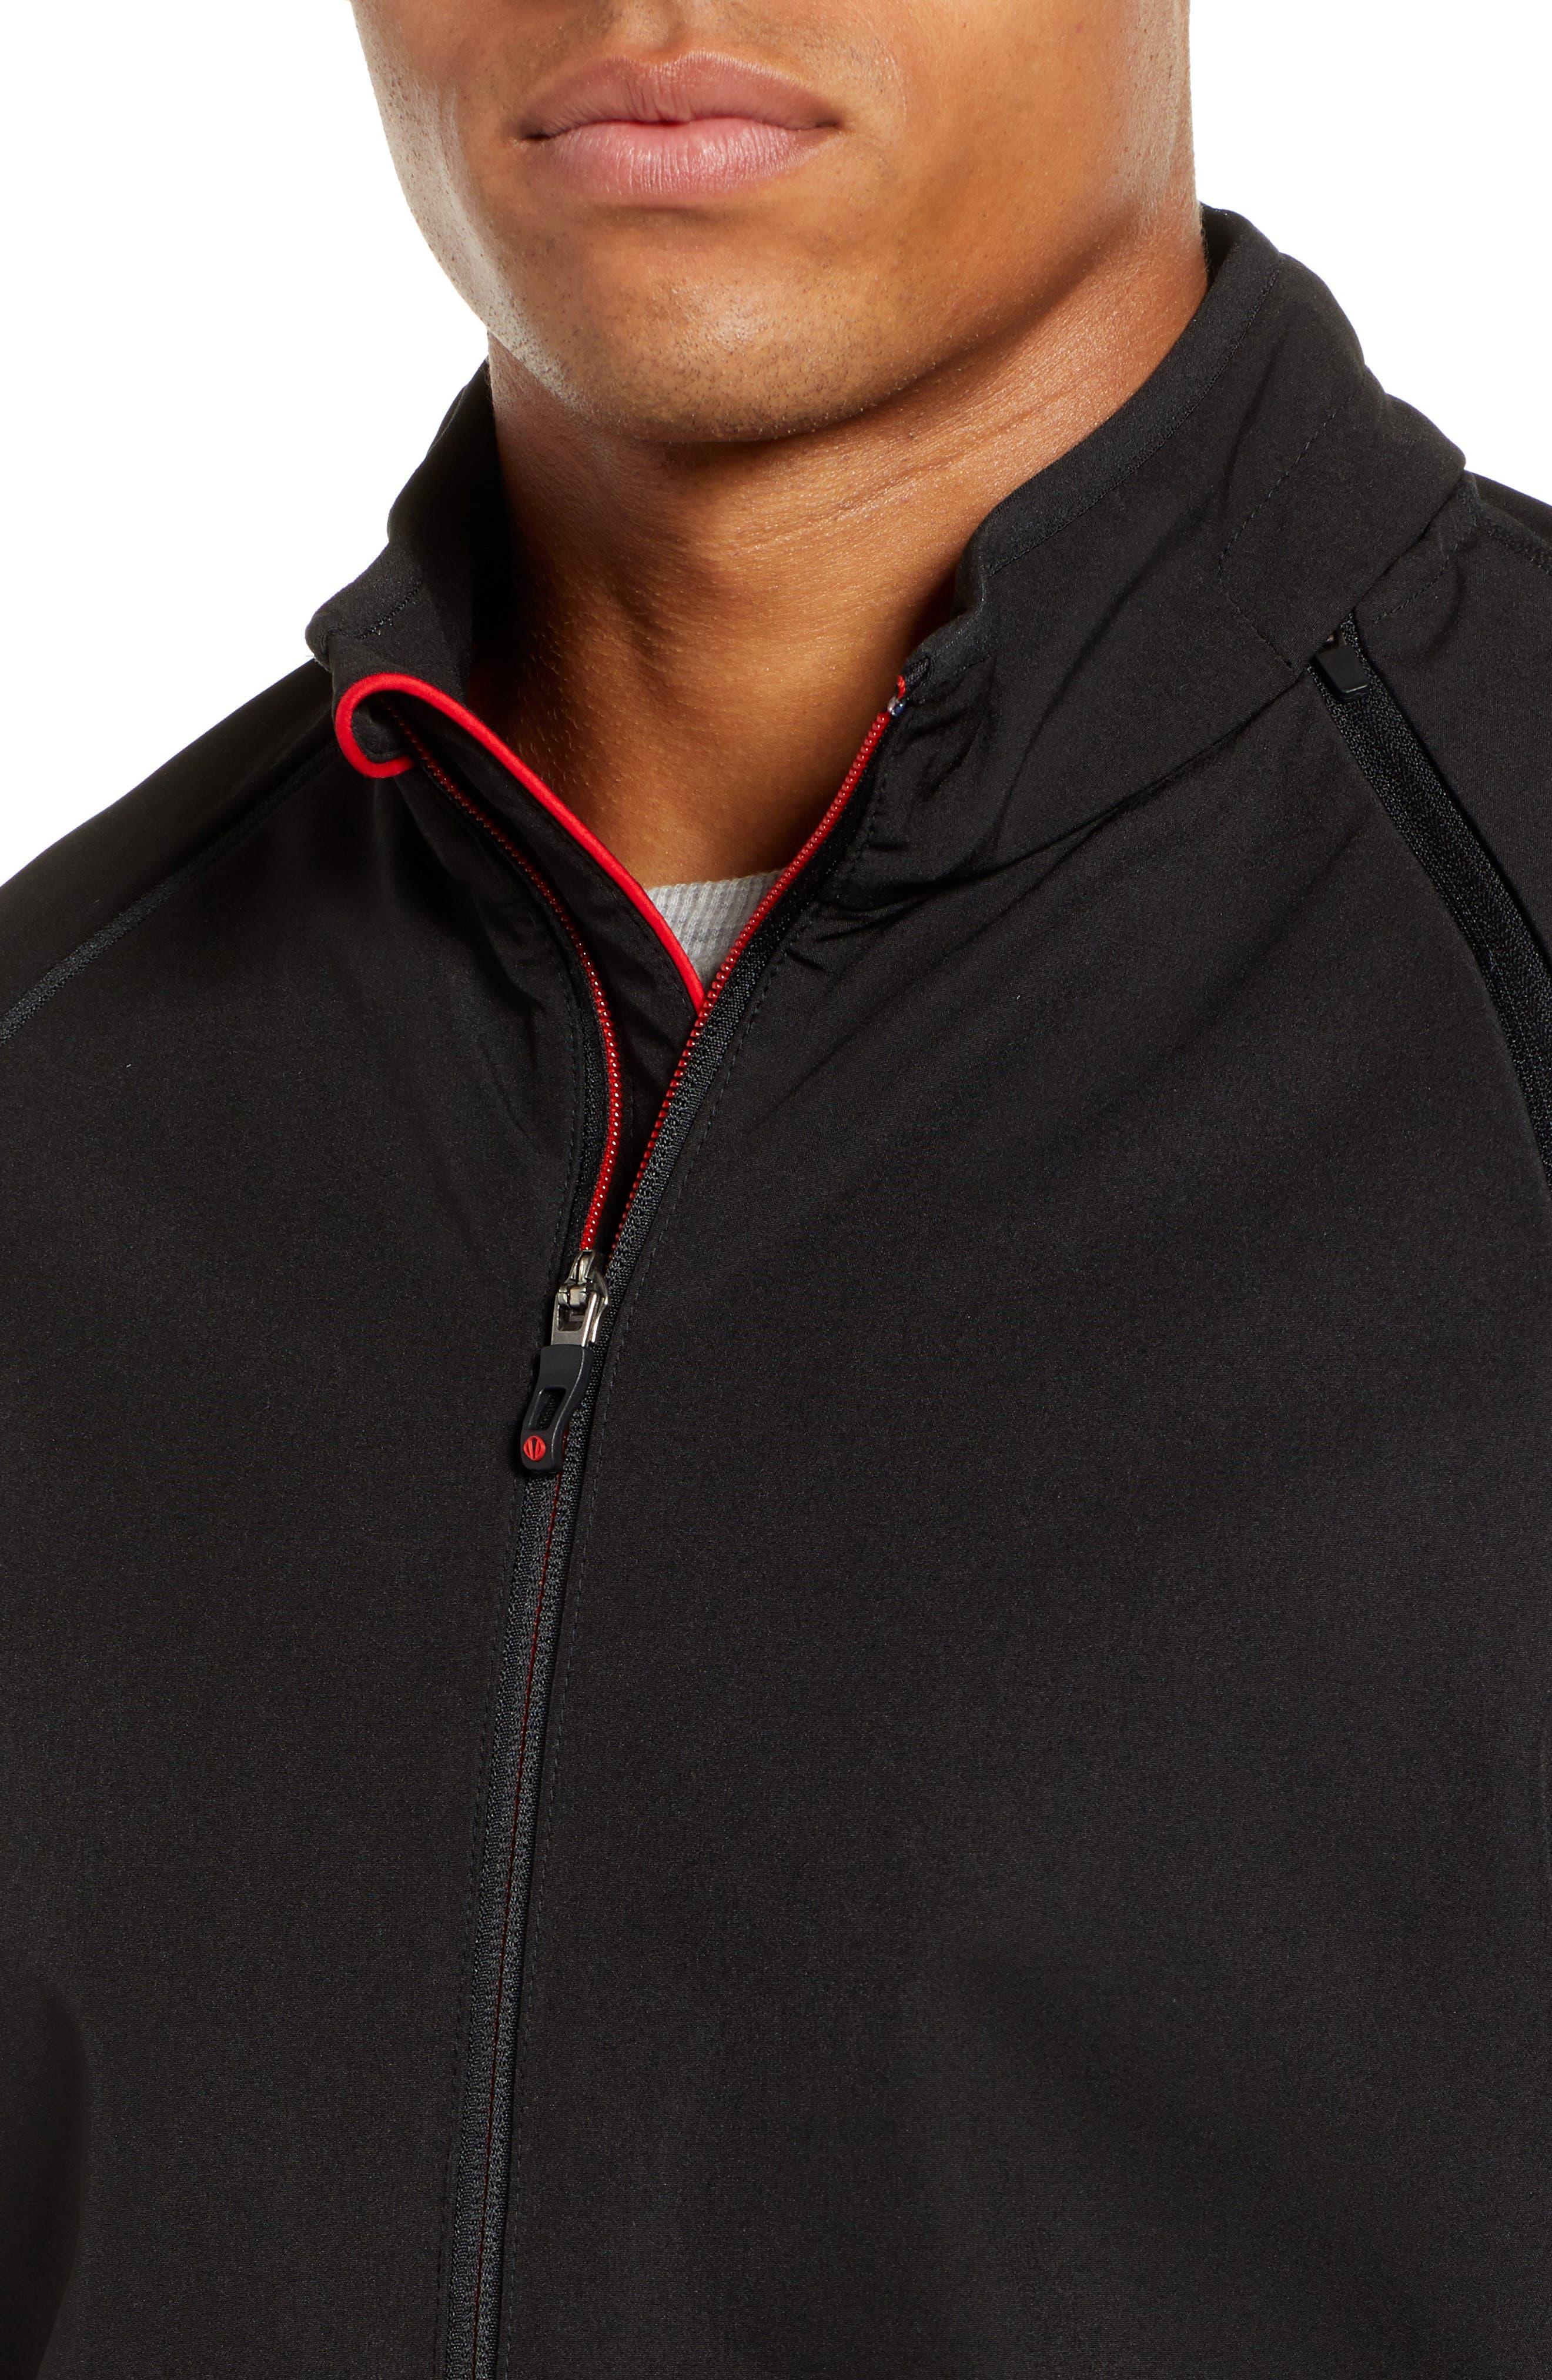 Hanson Water Repellent Convertible Jacket,                             Alternate thumbnail 6, color,                             BLACK